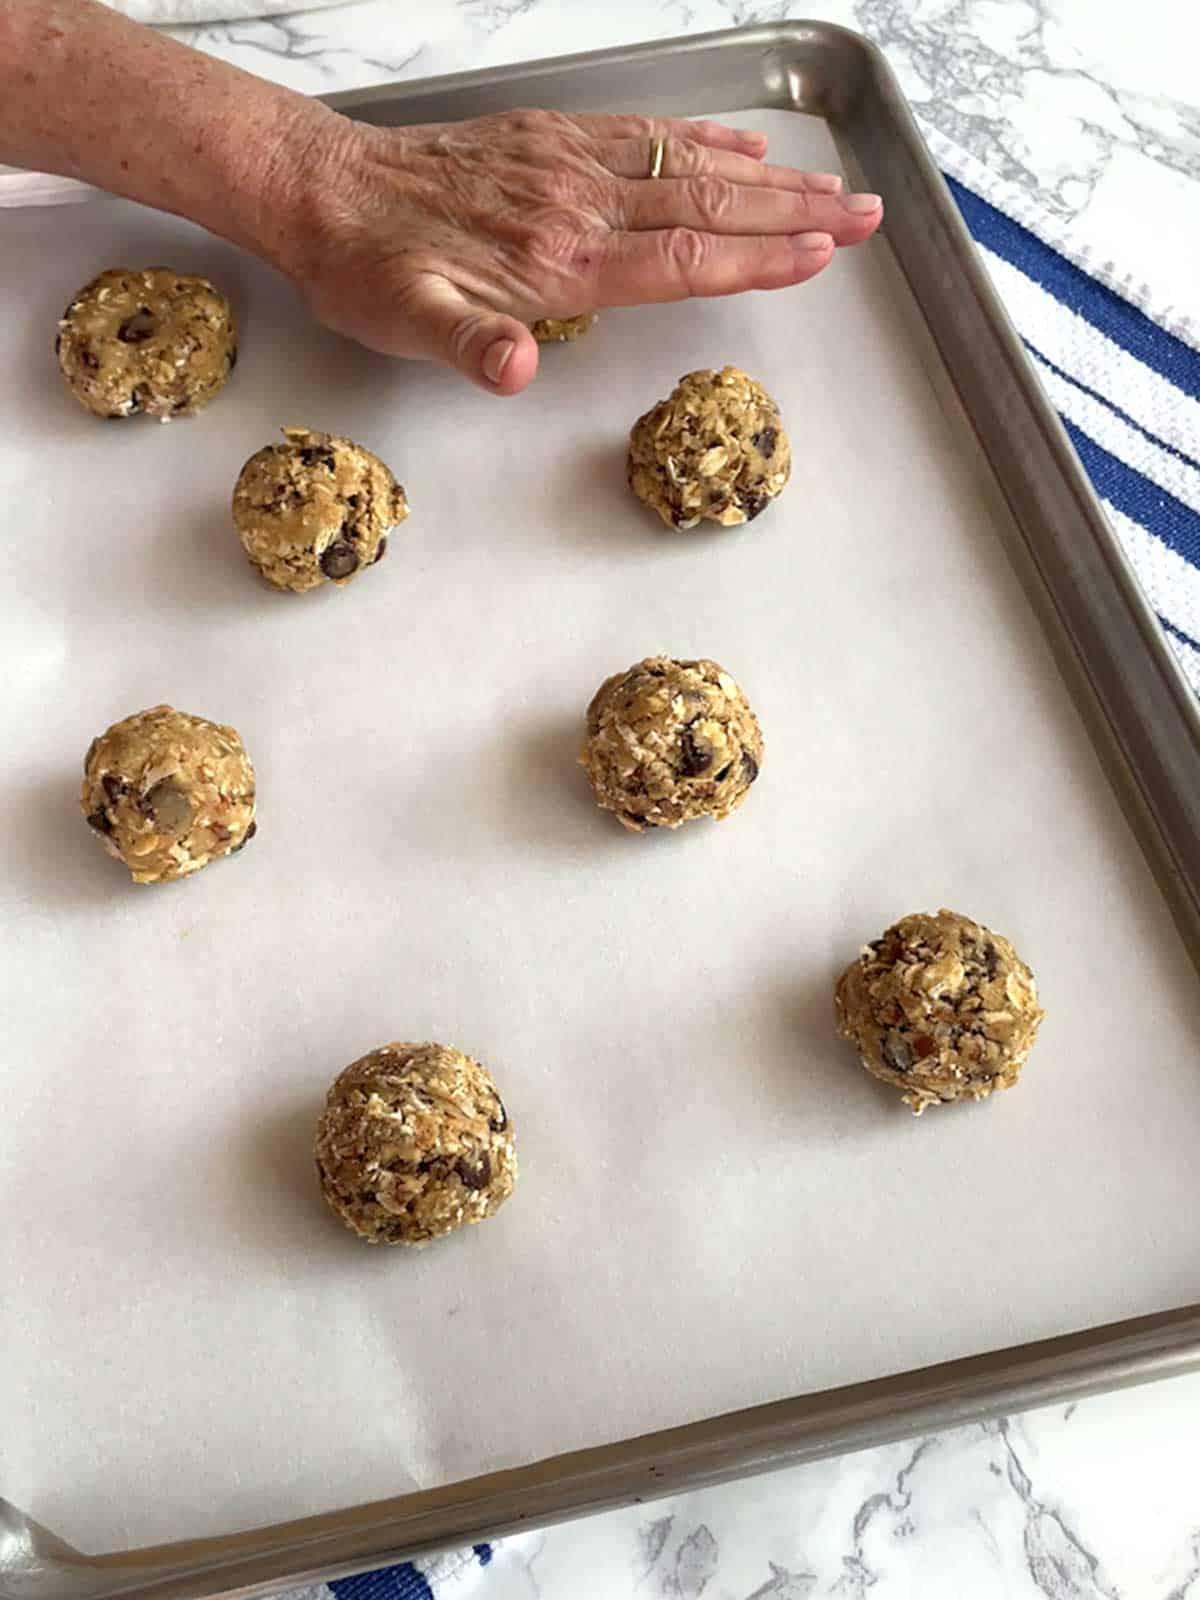 Flattening dough to ½-inch